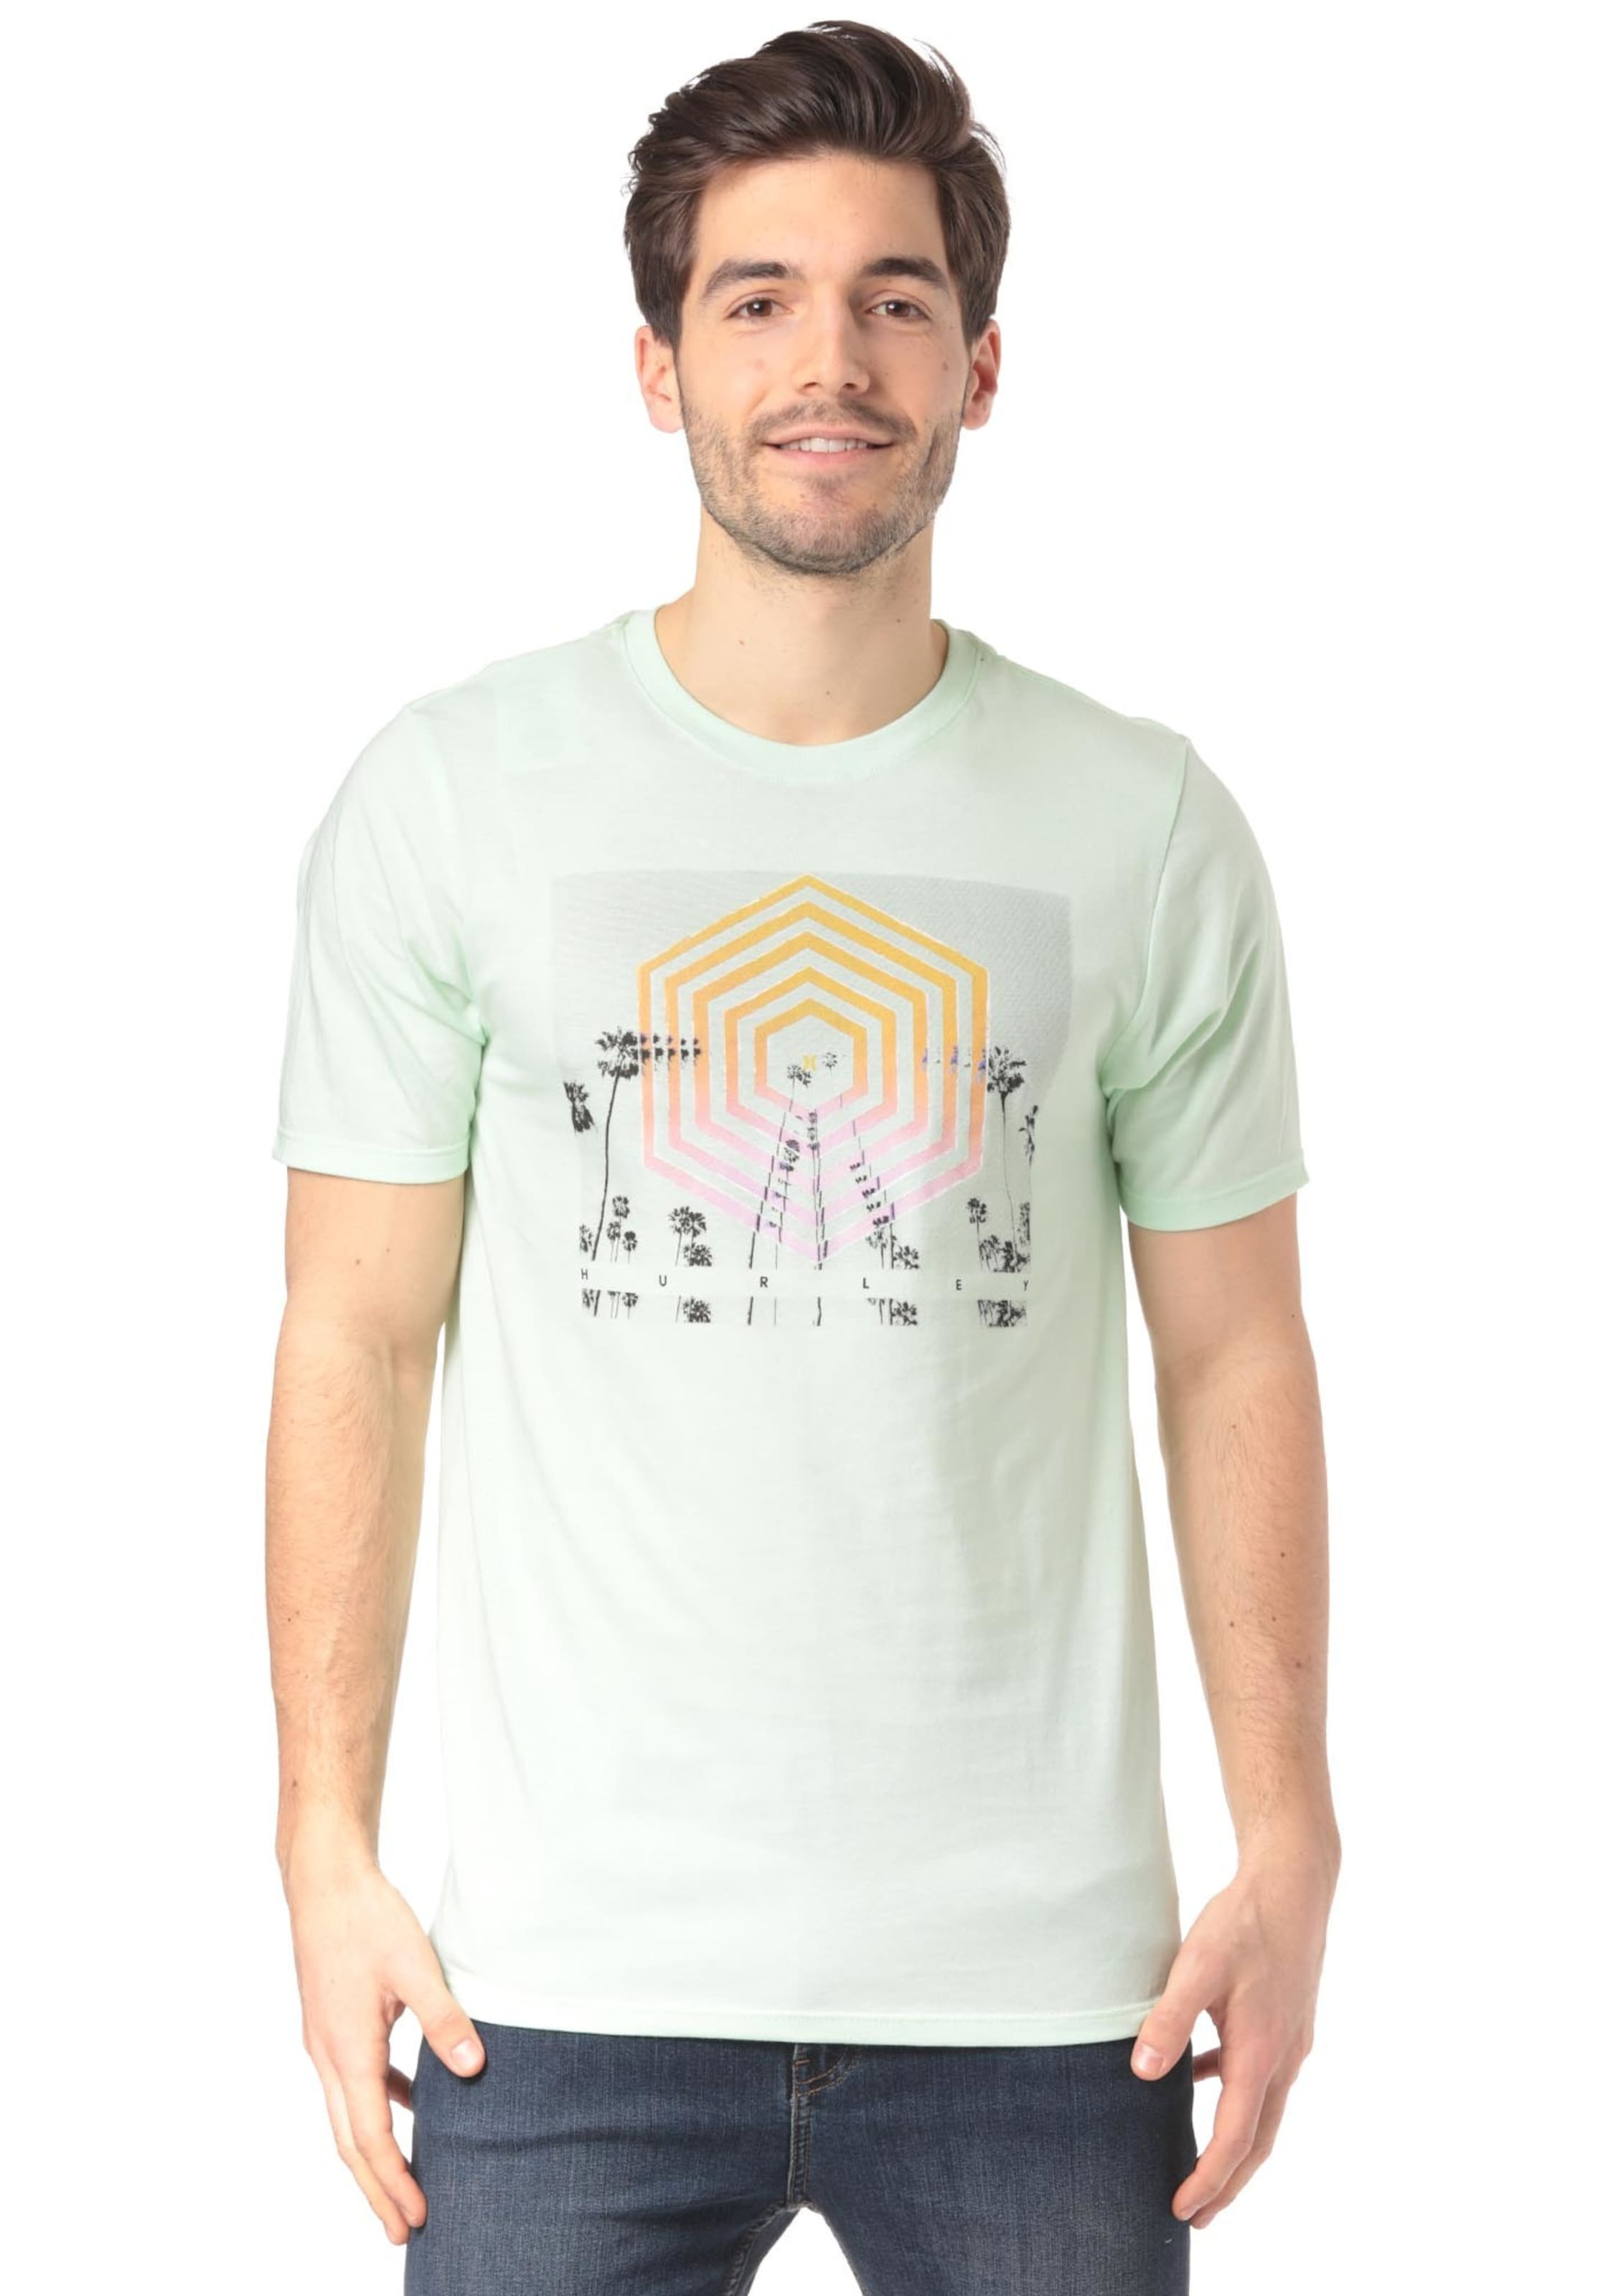 Hex' 'cutter Hurley T shirt In Mint OPXZkiu